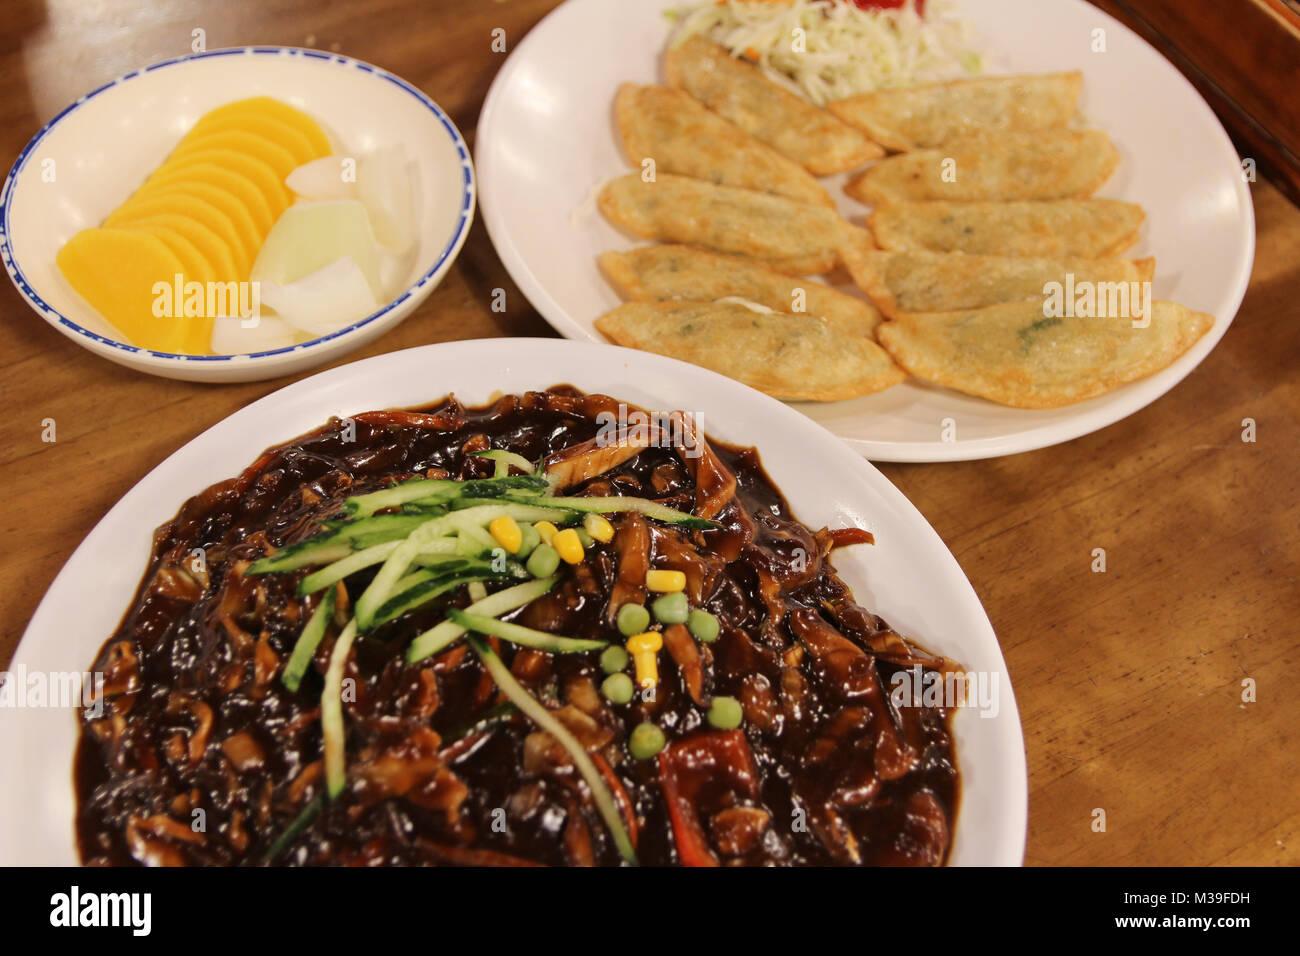 Jajangmyeon, Korean black bean sauce noodles with the fried dumplings and pickled at Korean restaurant, Busan, South - Stock Image